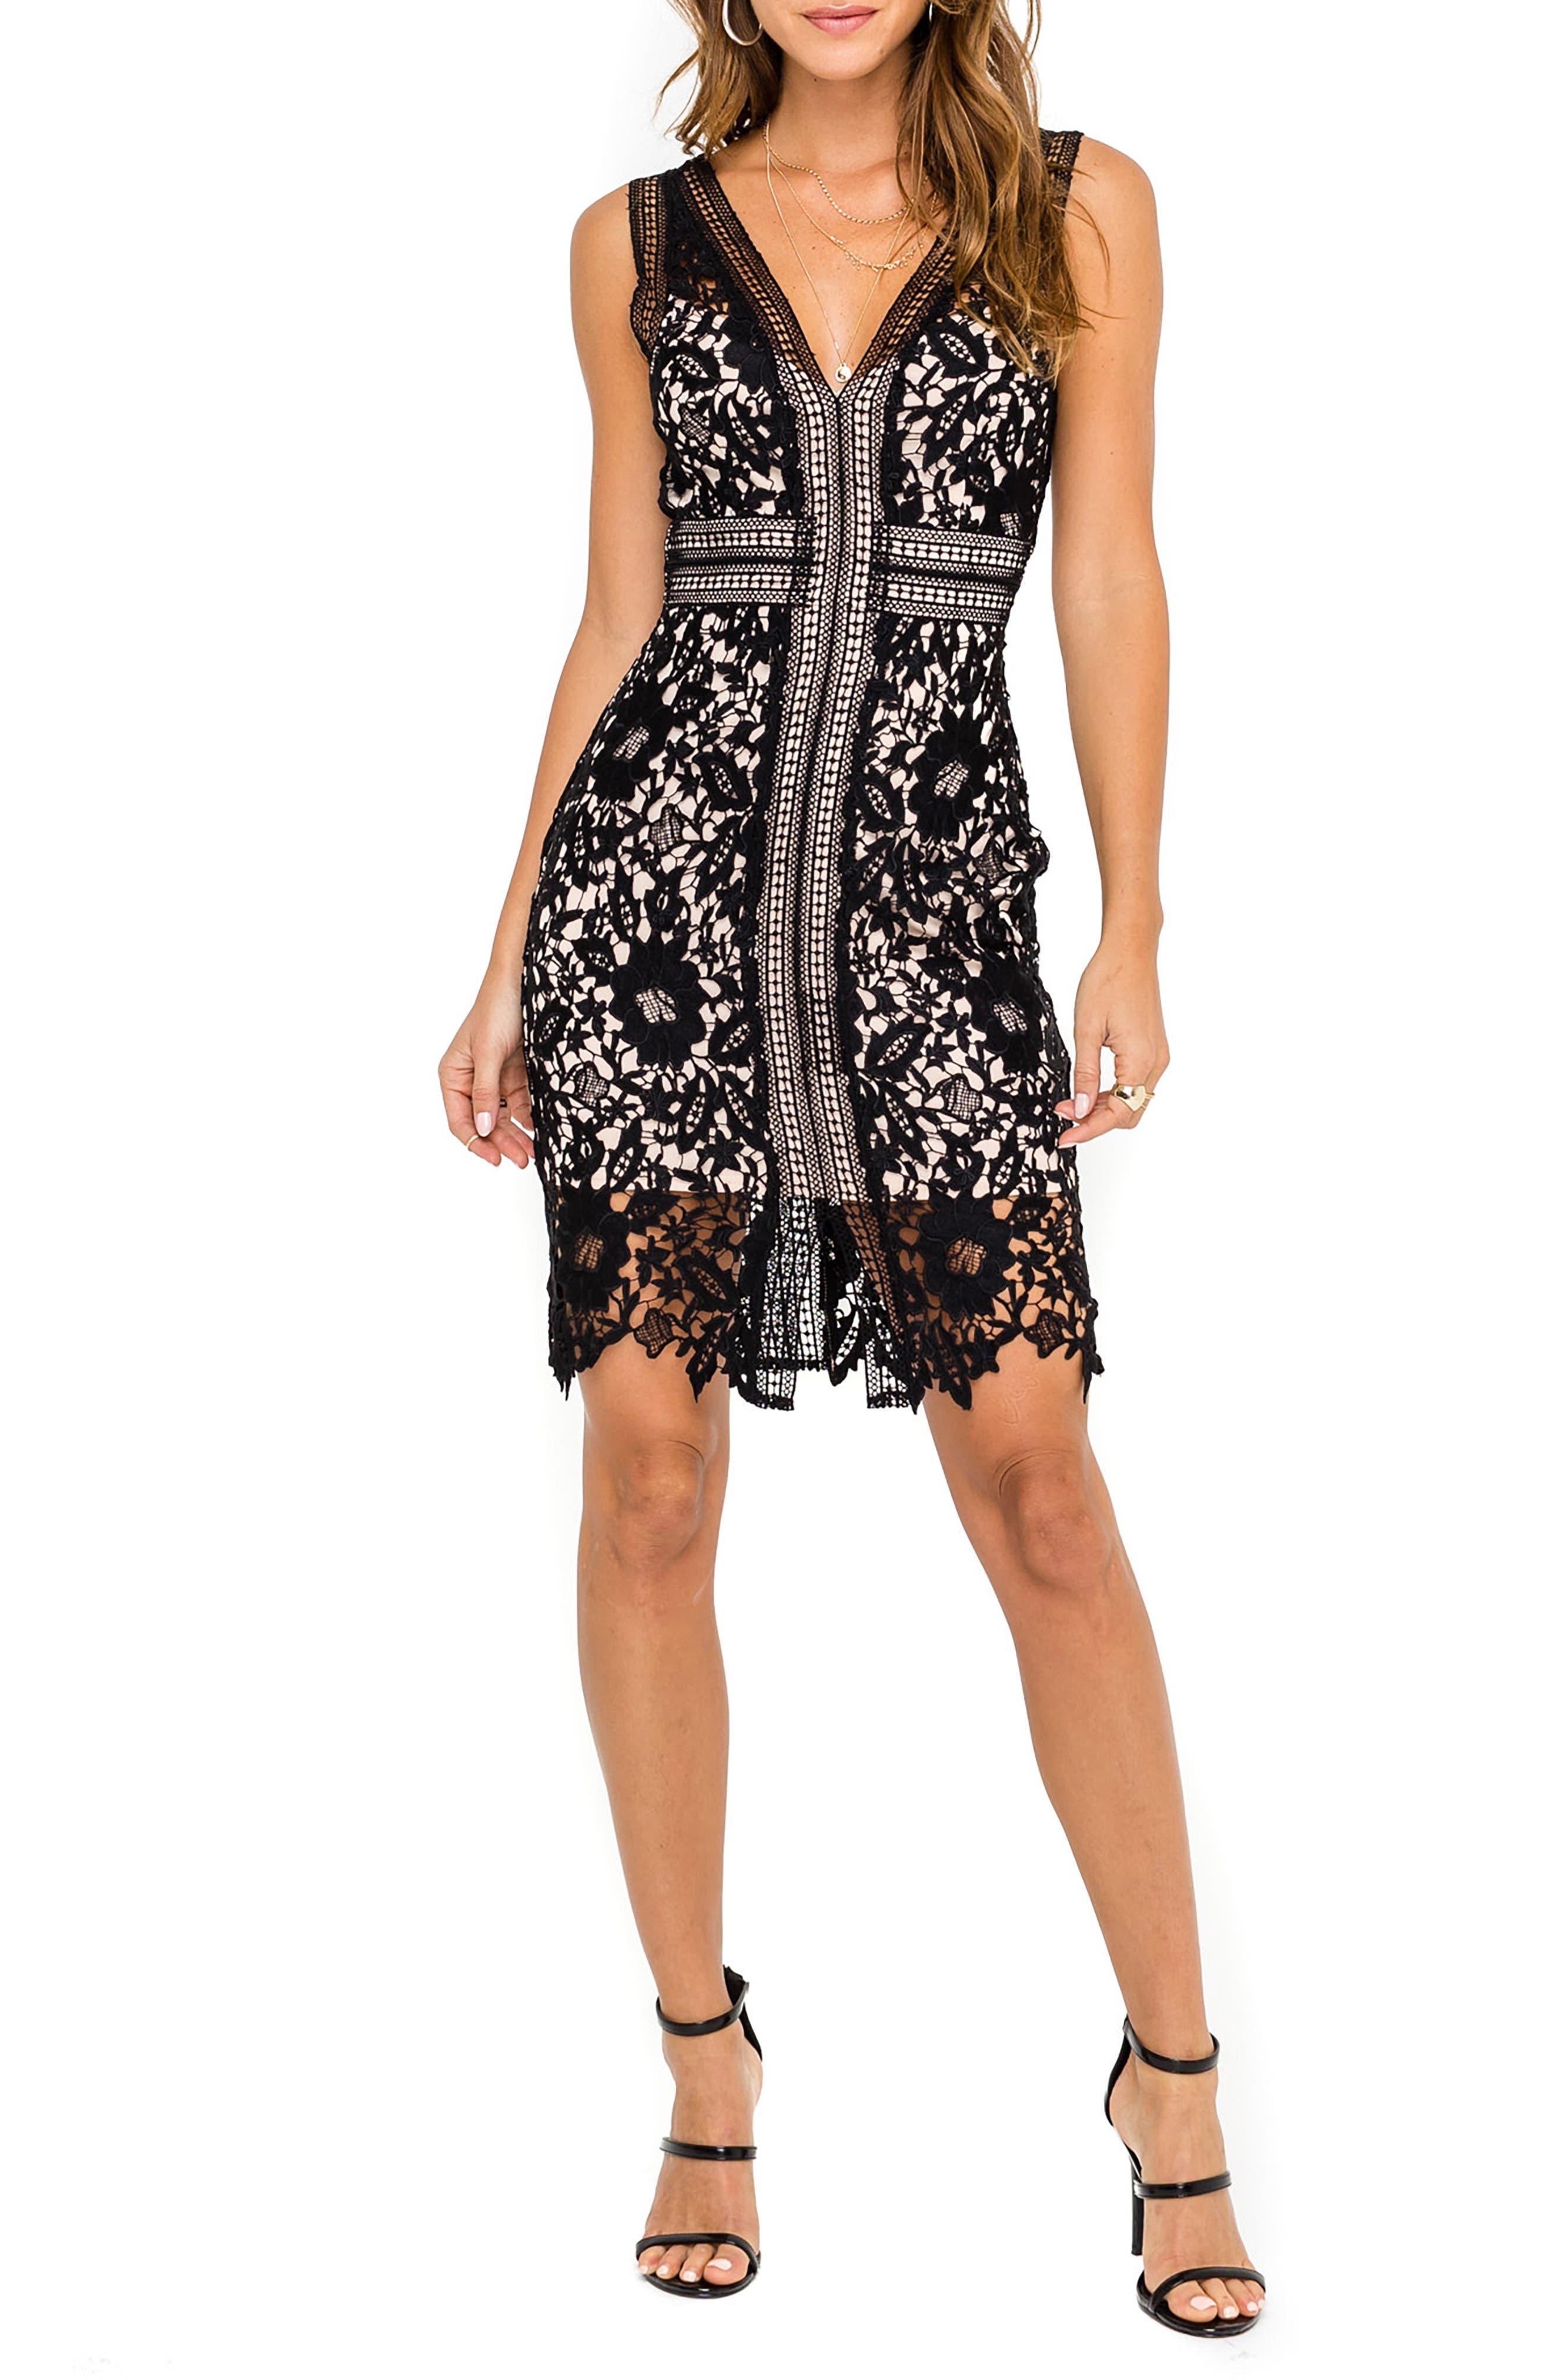 ASTR THE LABEL Lace Sheath Dress, Main, color, 001